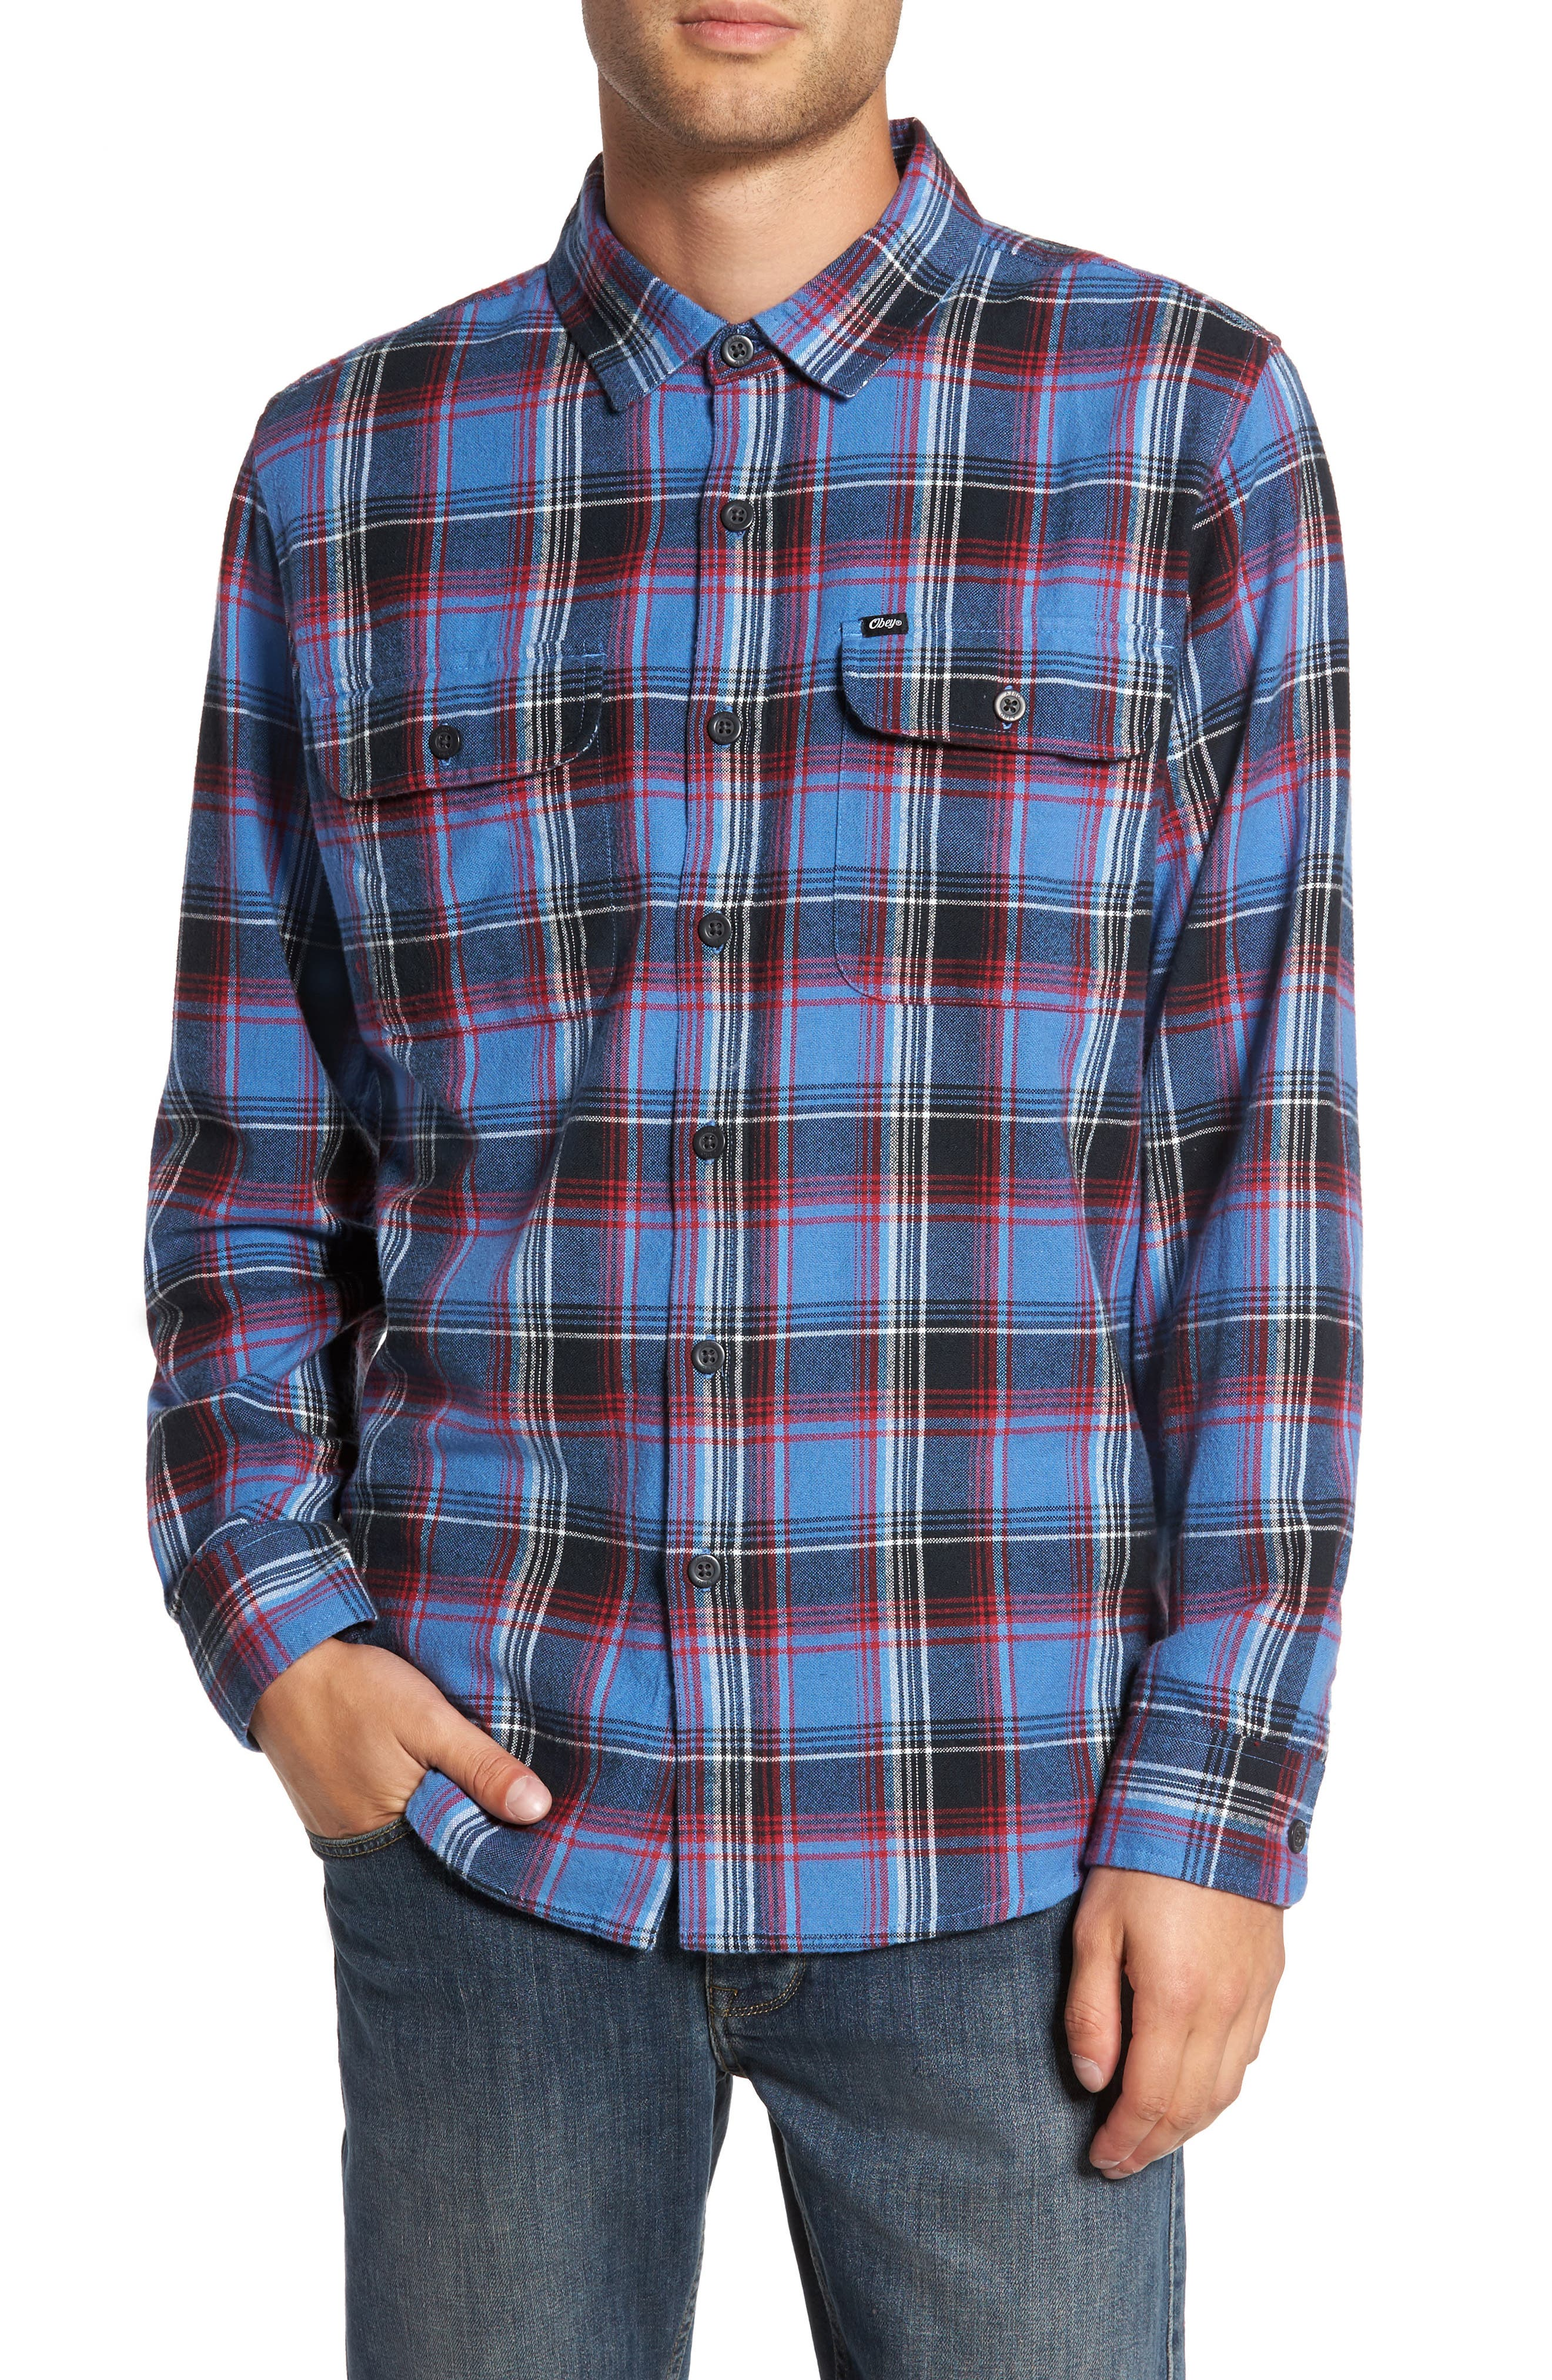 Marvyn Plaid Woven Shirt,                             Main thumbnail 1, color,                             410